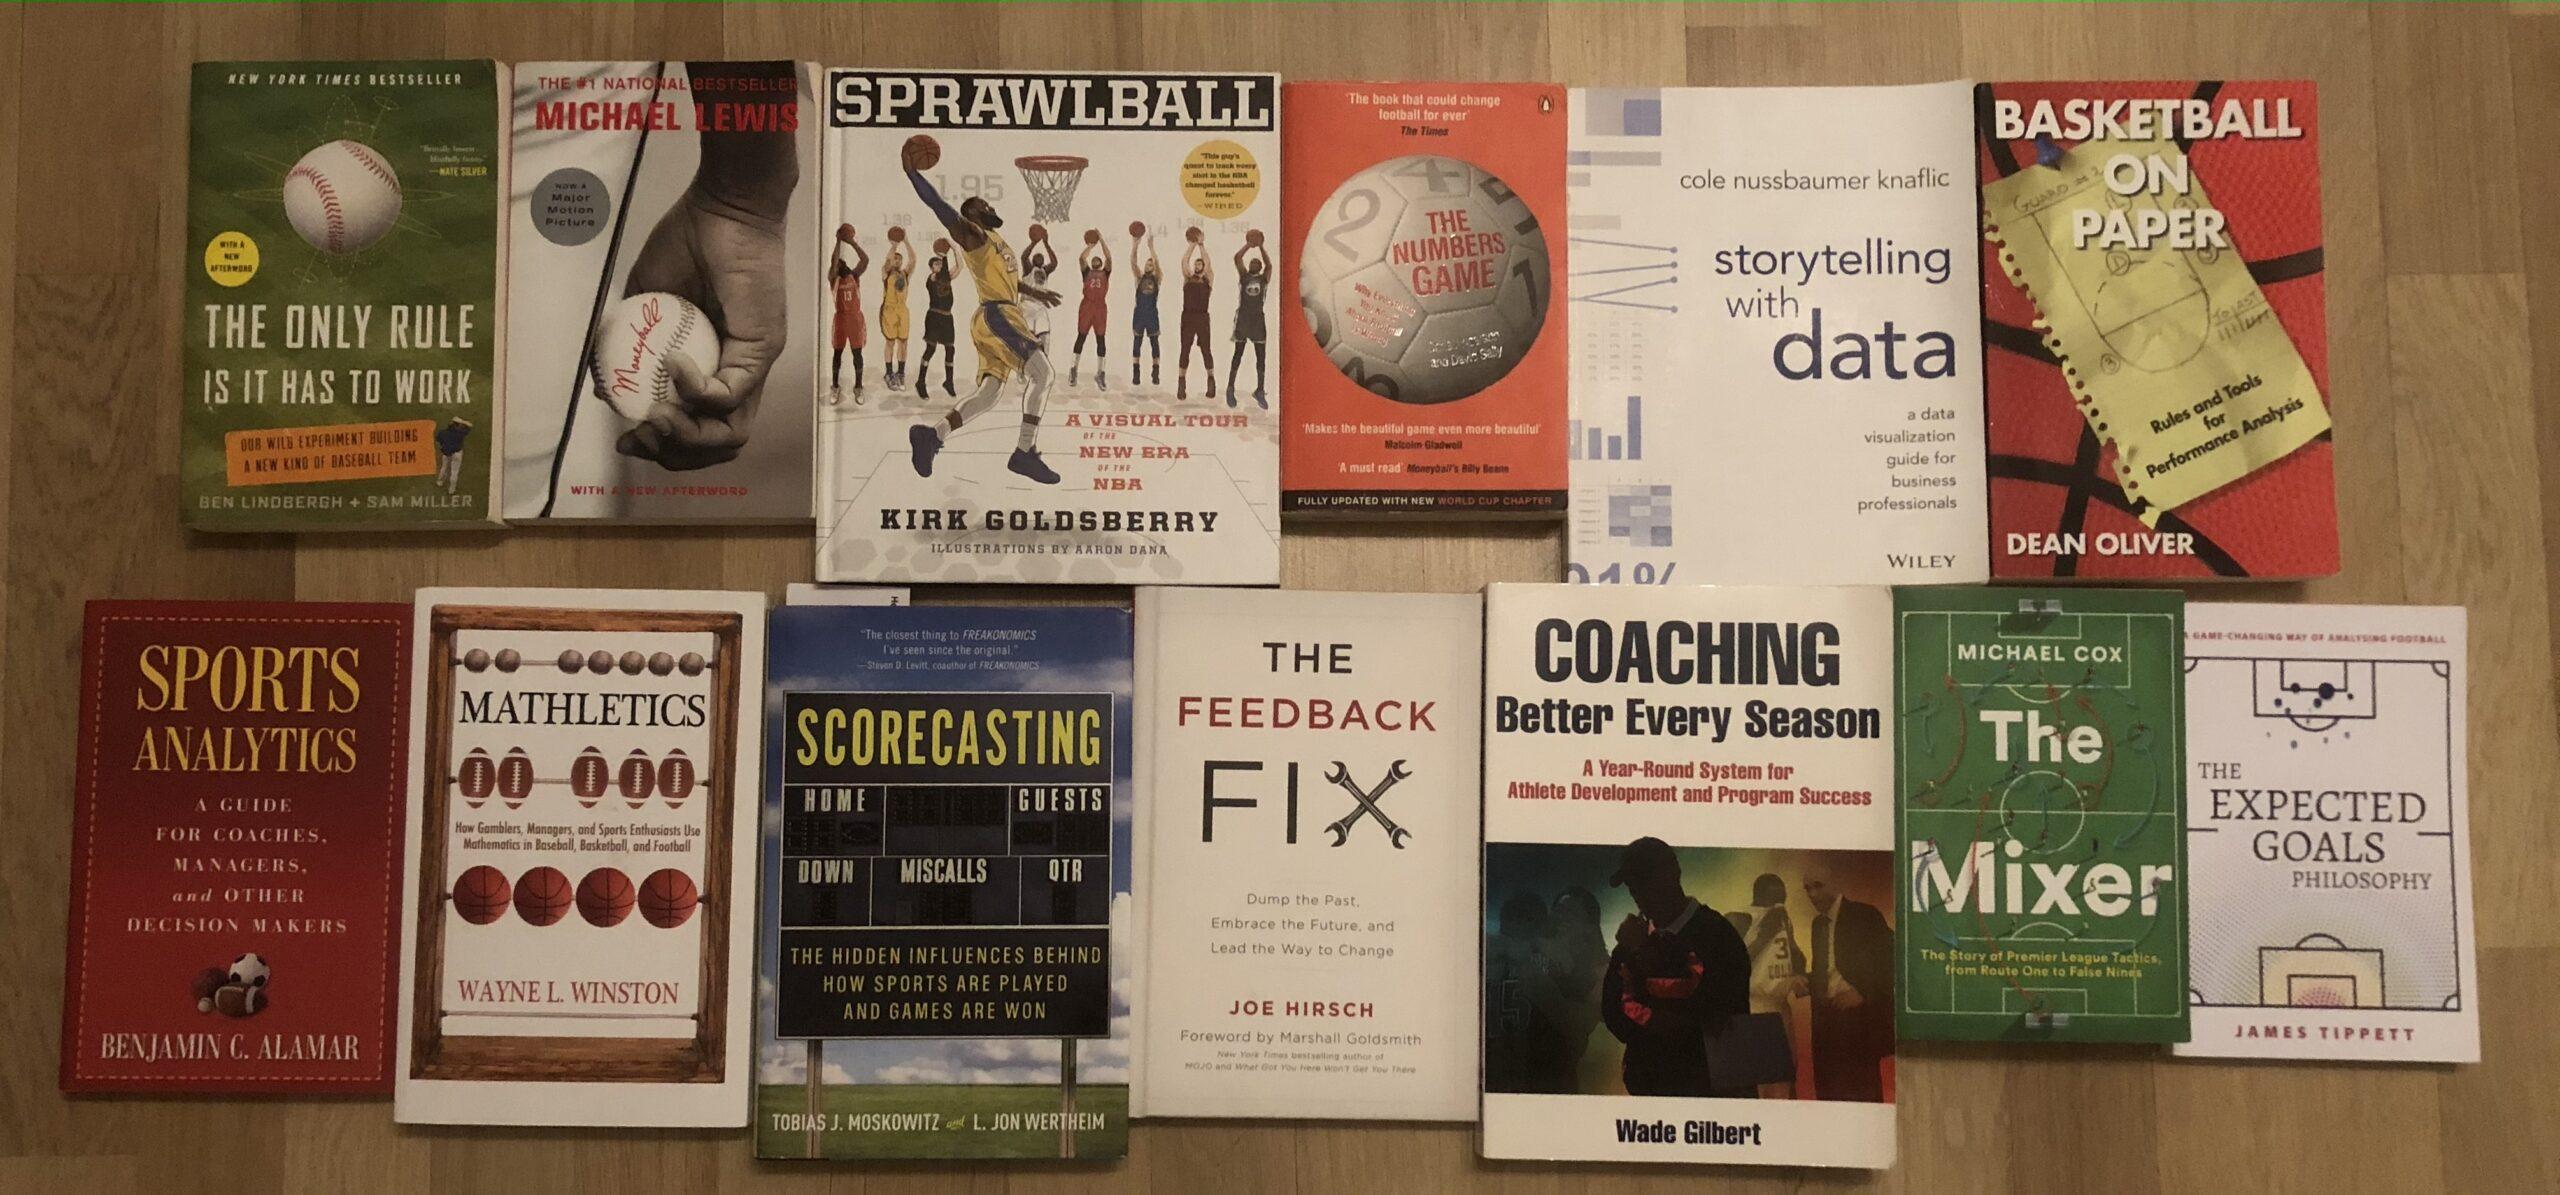 5 Best Sports Analysis Books